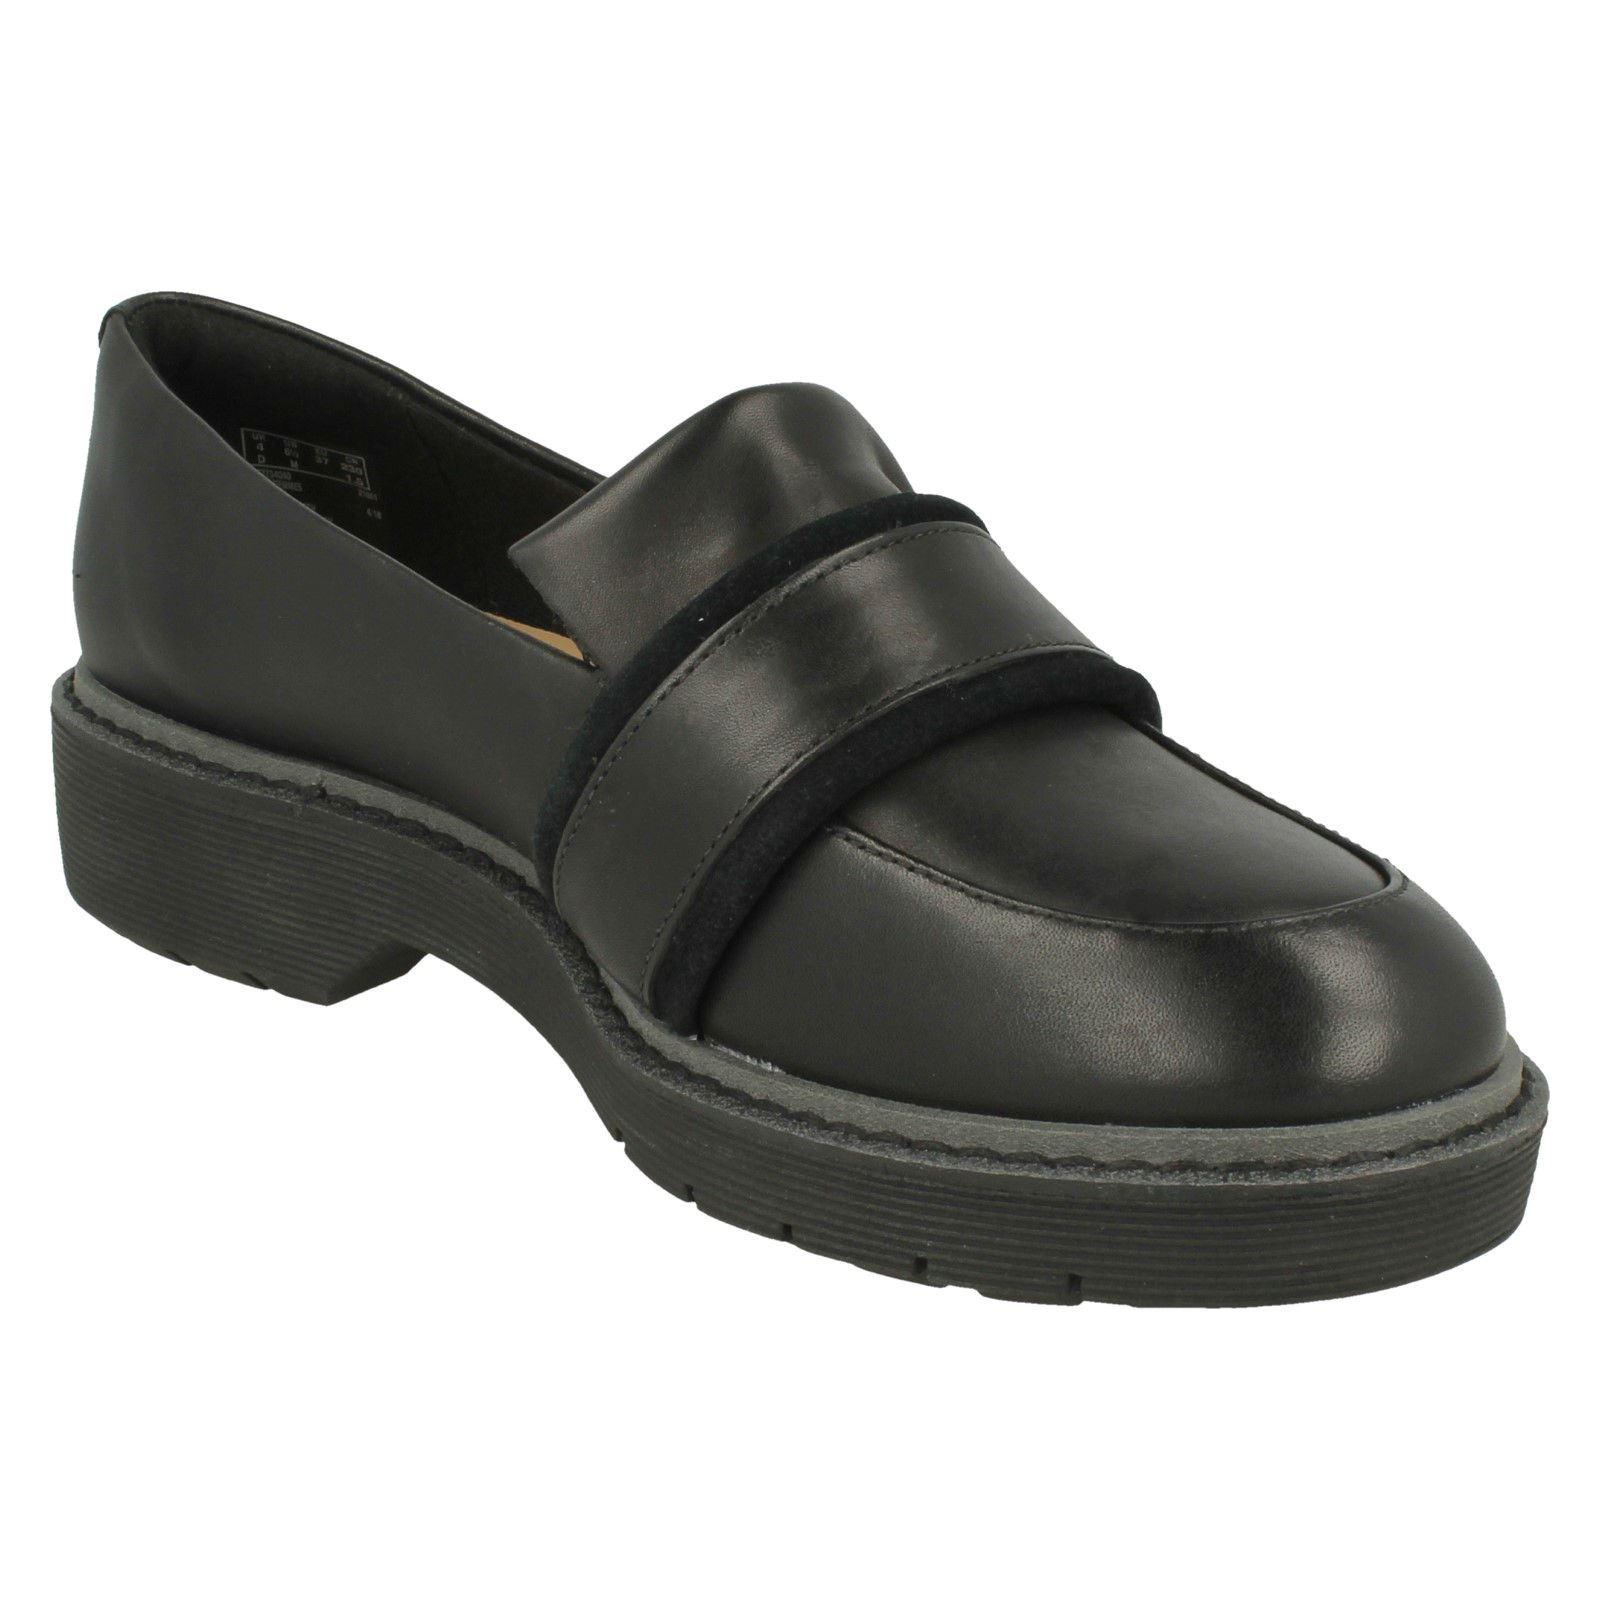 Ibfyvy76g Mujer Alexa Pantuflas Bajas Rubí Clarks Inspirado Zapatos rdtQshCxBo